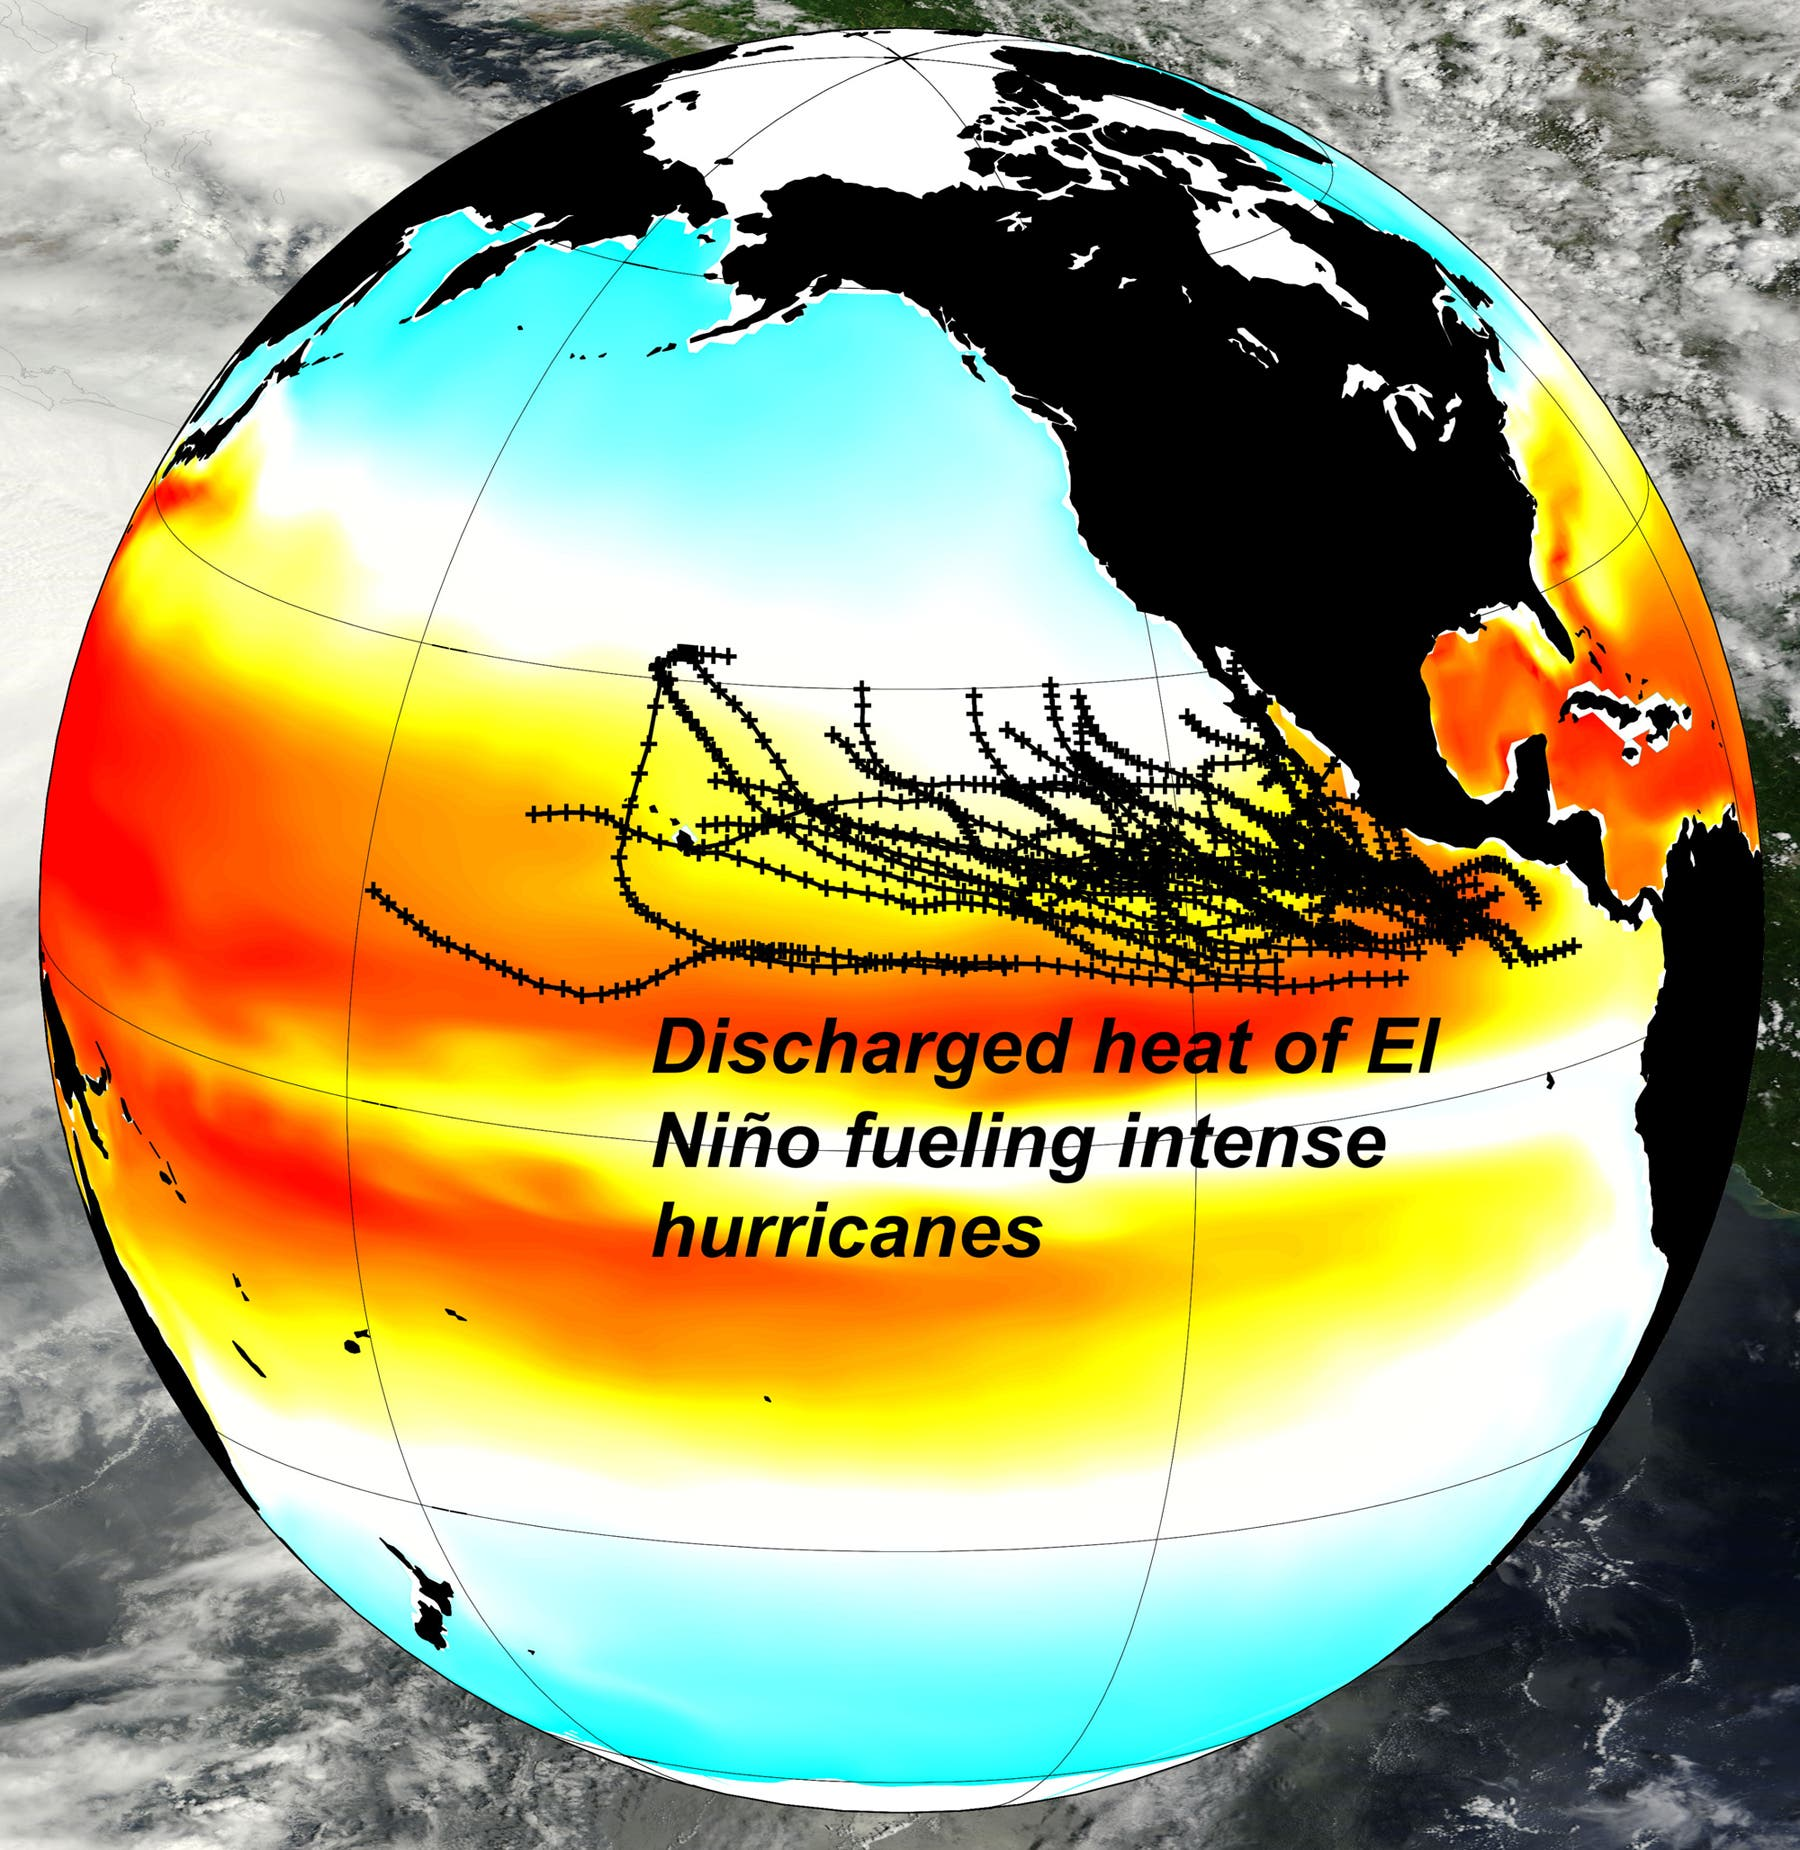 El Niño transferiert Wärme in die hohen Breiten